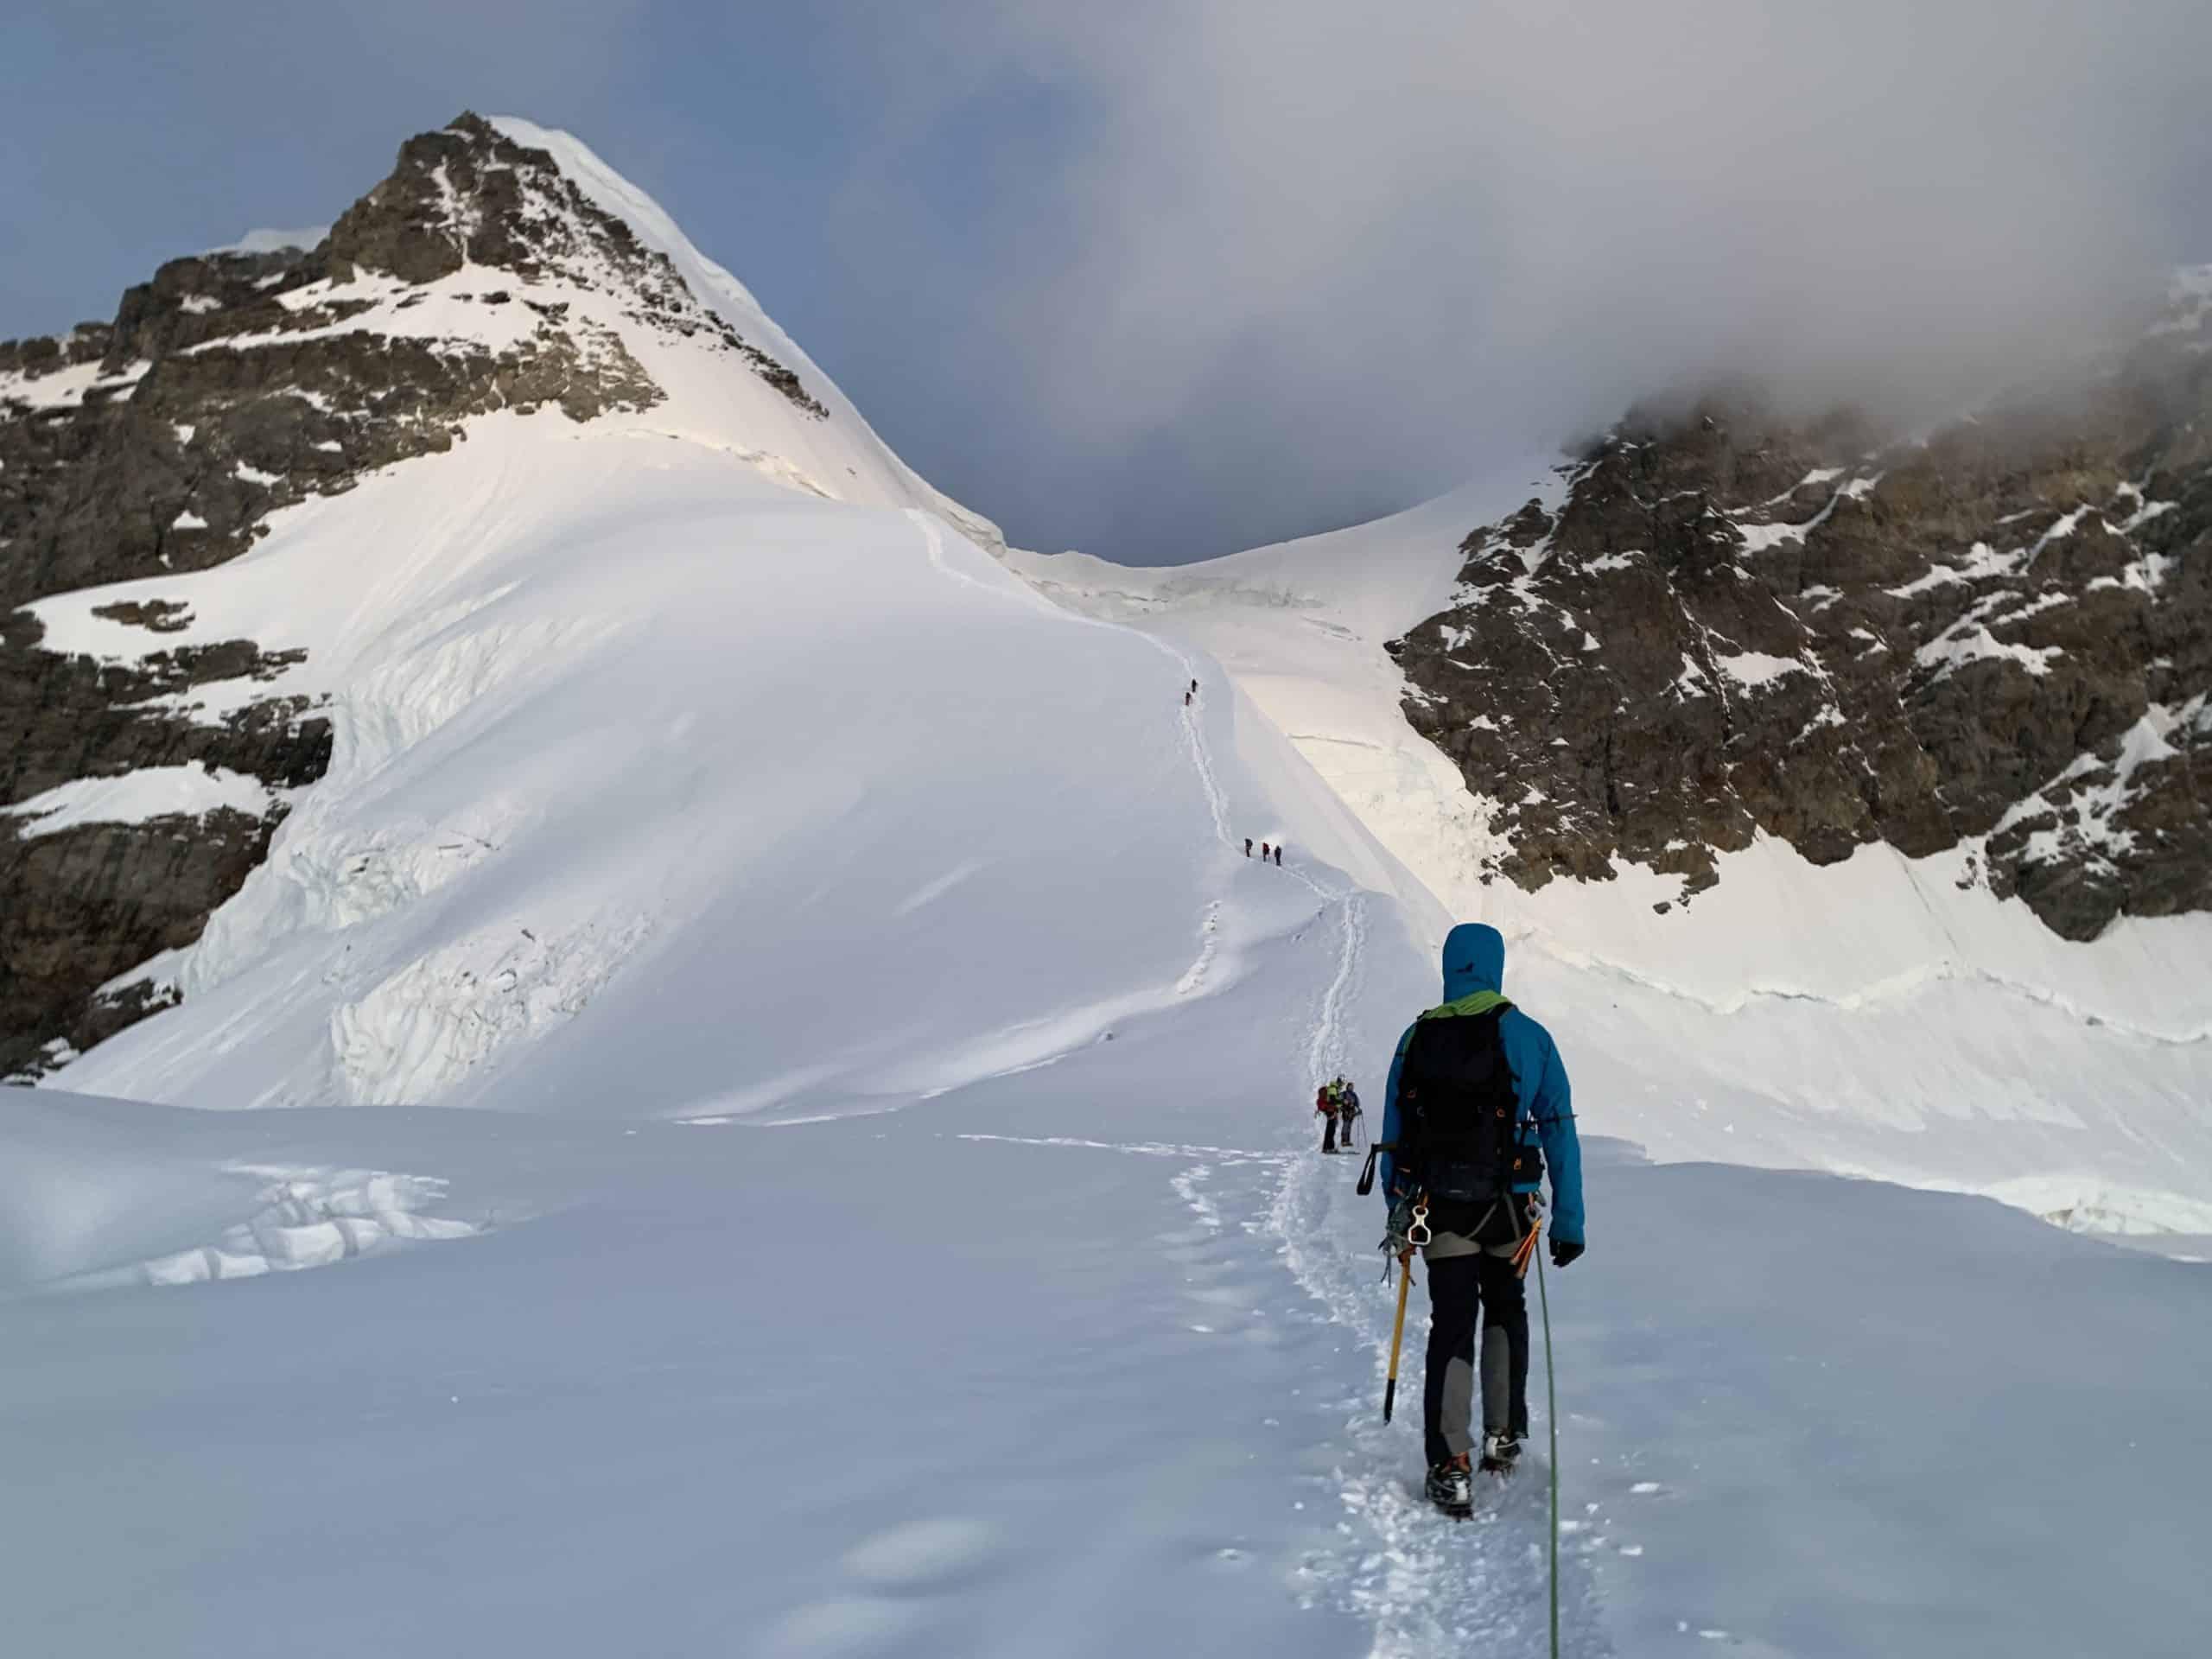 IMG 3847 scaled - Jungfrau - der Star im Berner Oberland